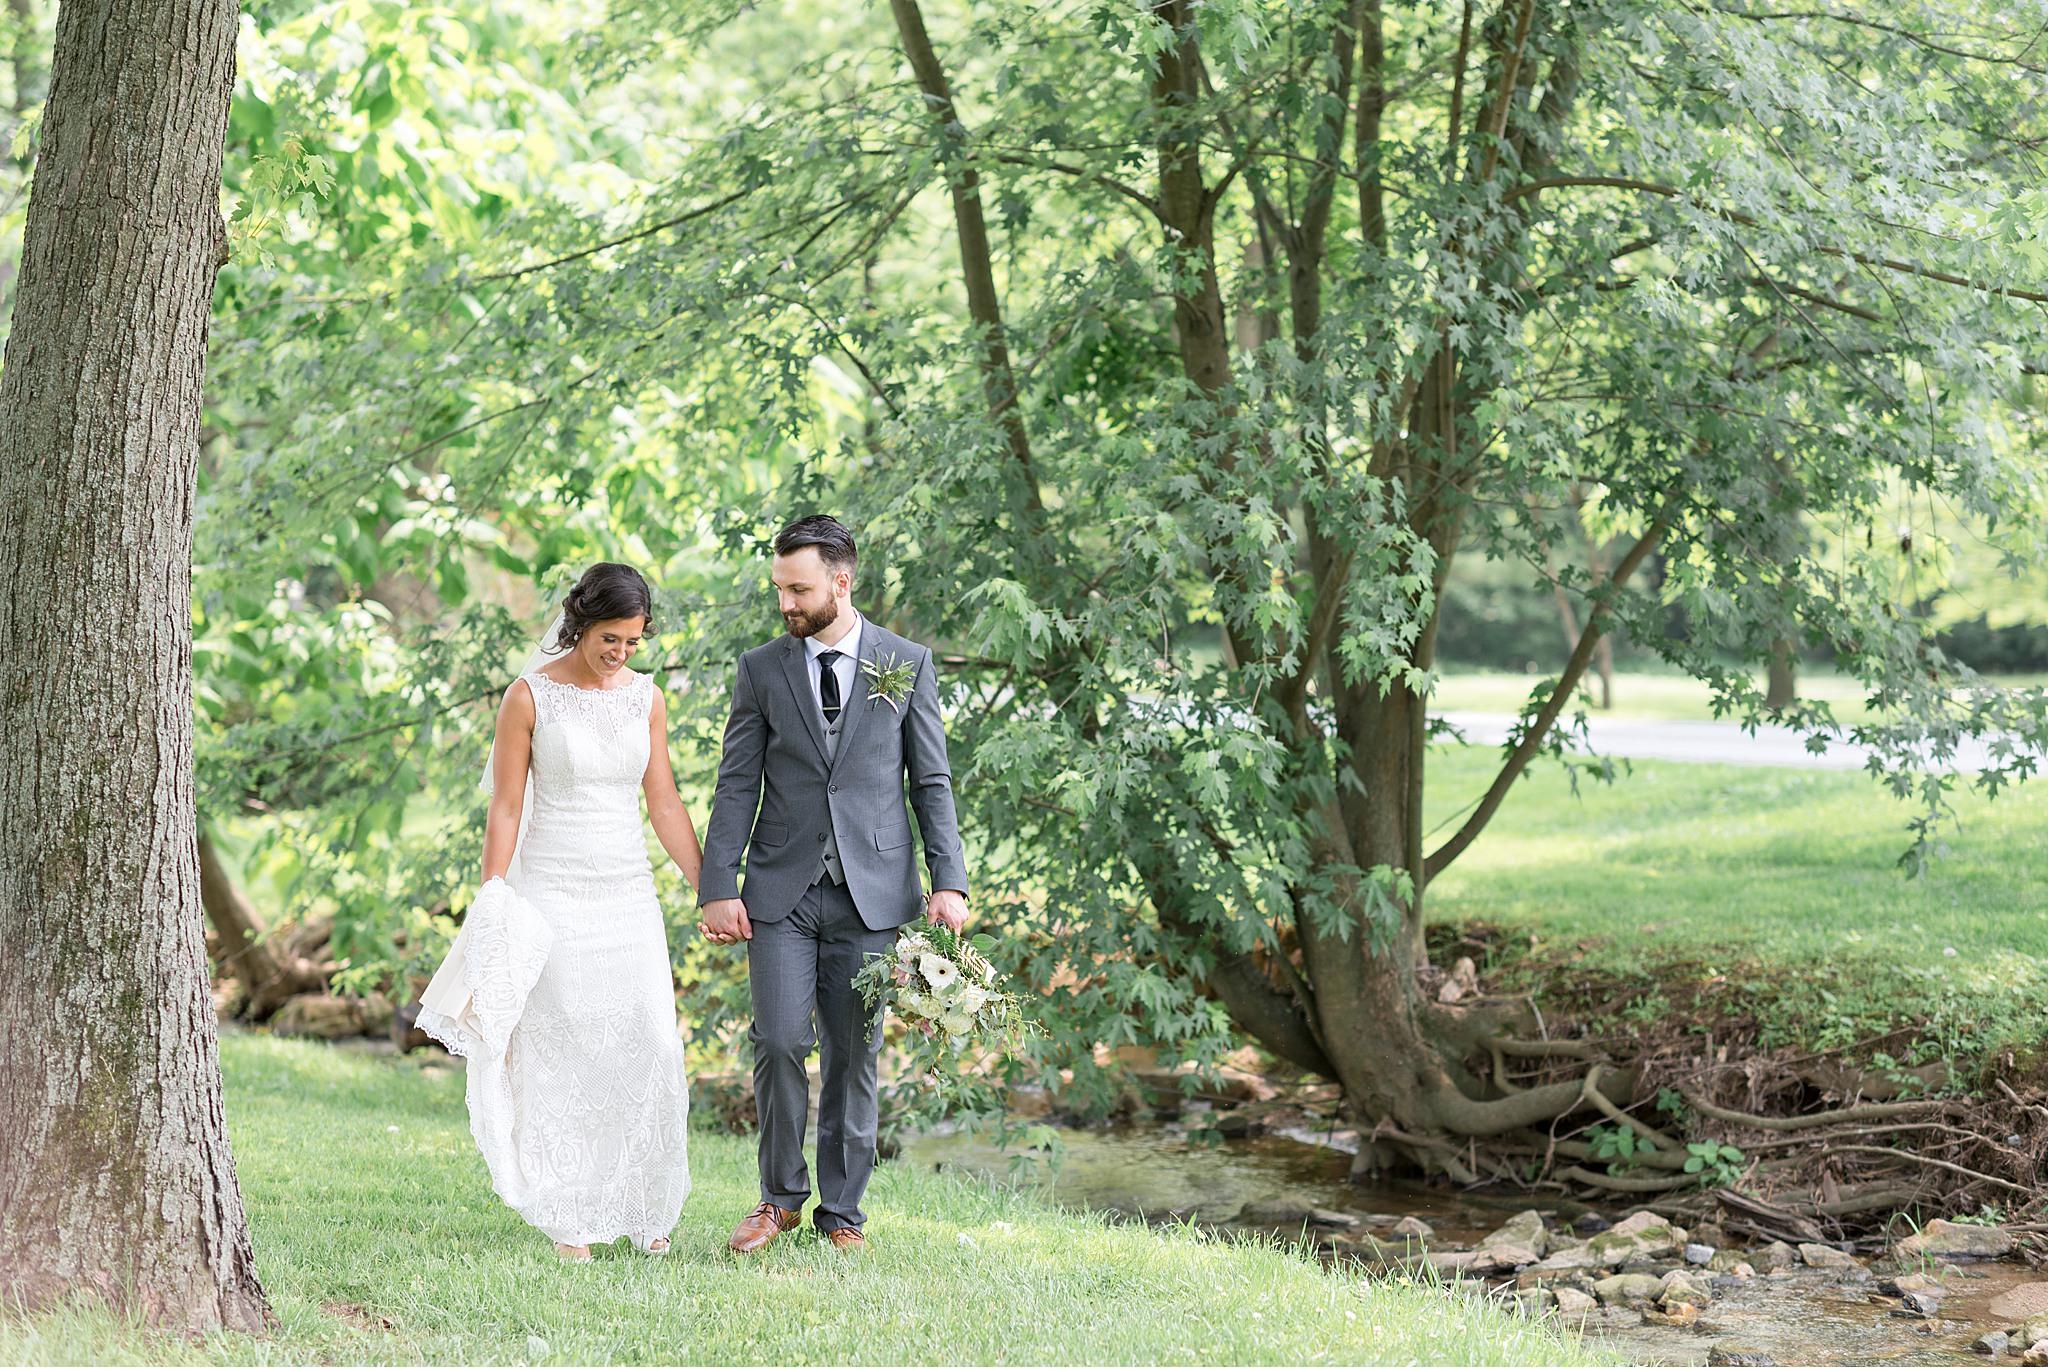 Simmontown wedding Barn Lancaster PA wedding engagement Photography_3600.jpg